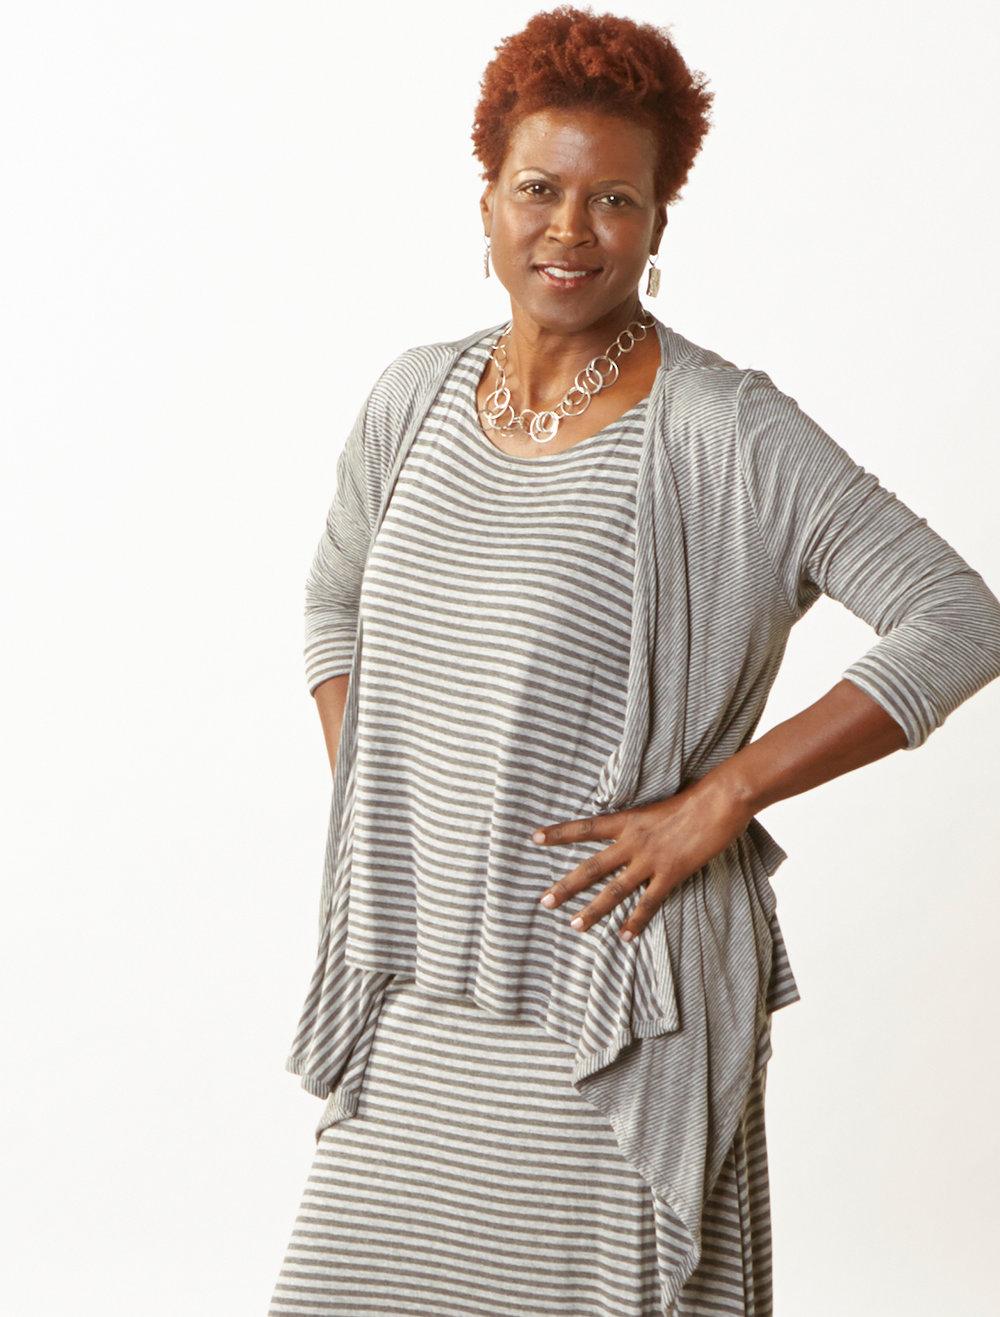 Alta Cardigan, Renee Tank, Gaucho Pant in Grey Double Stripe Jersey